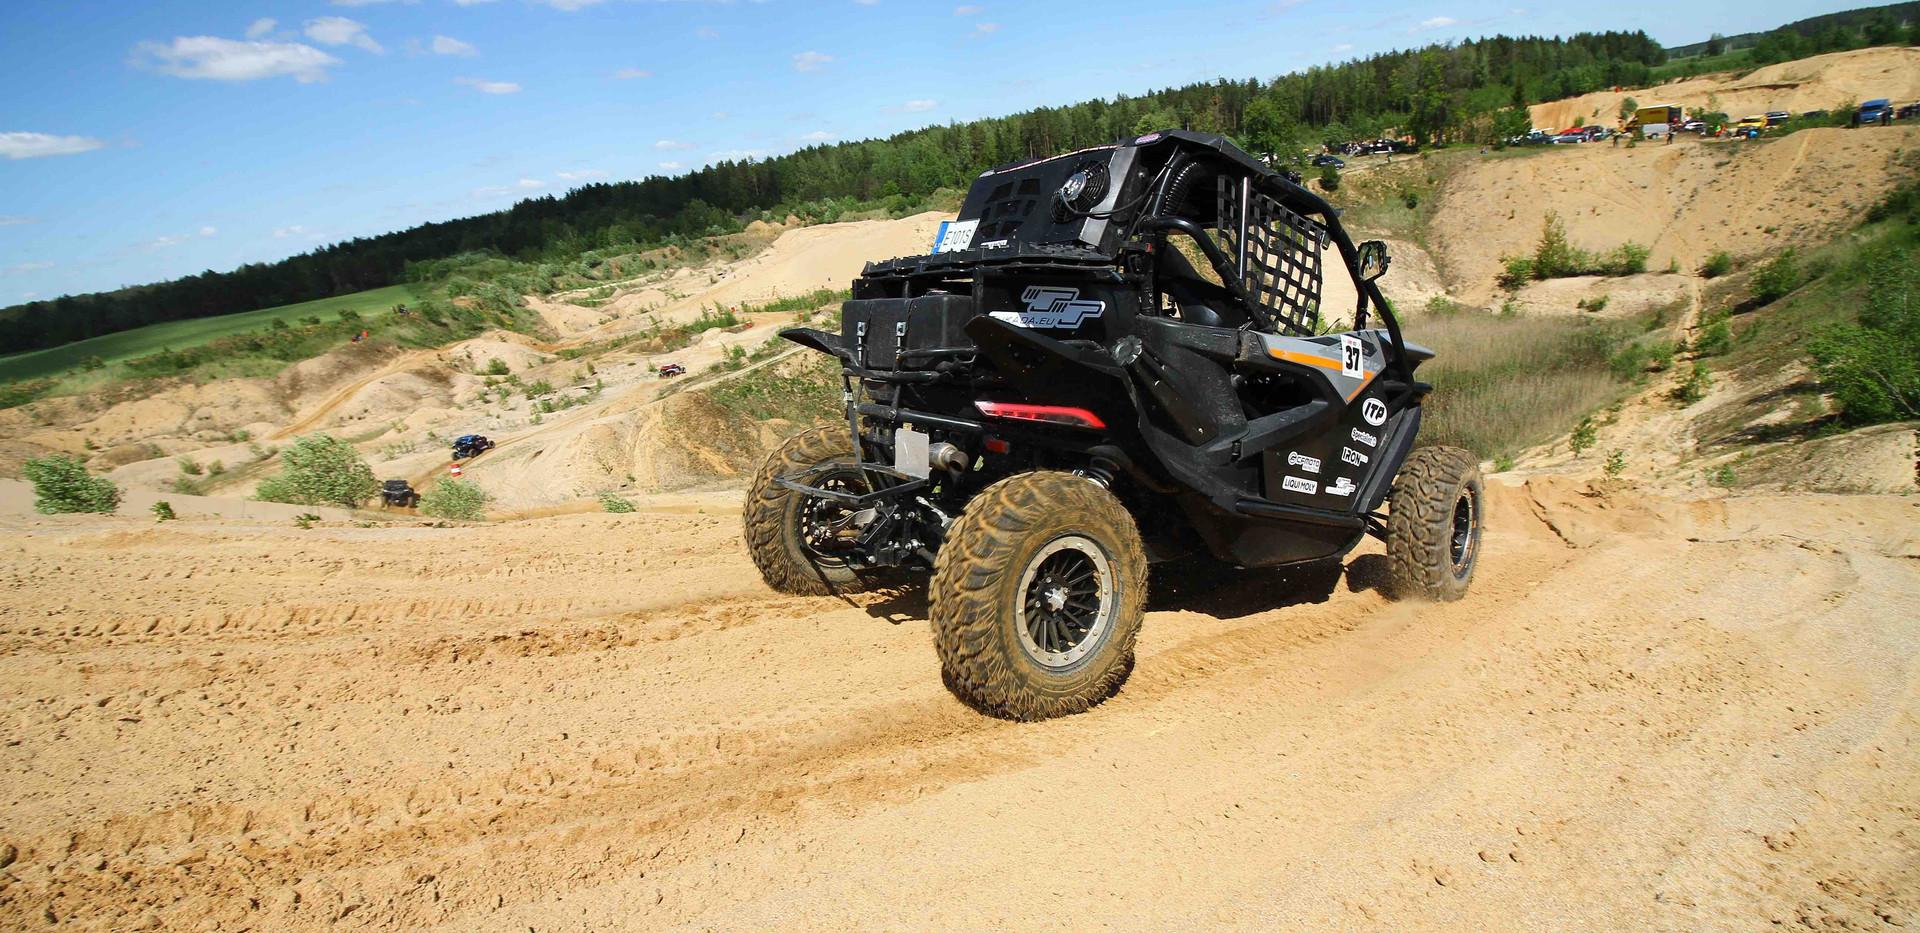 cfmoto racingteam sand box12.jpeg